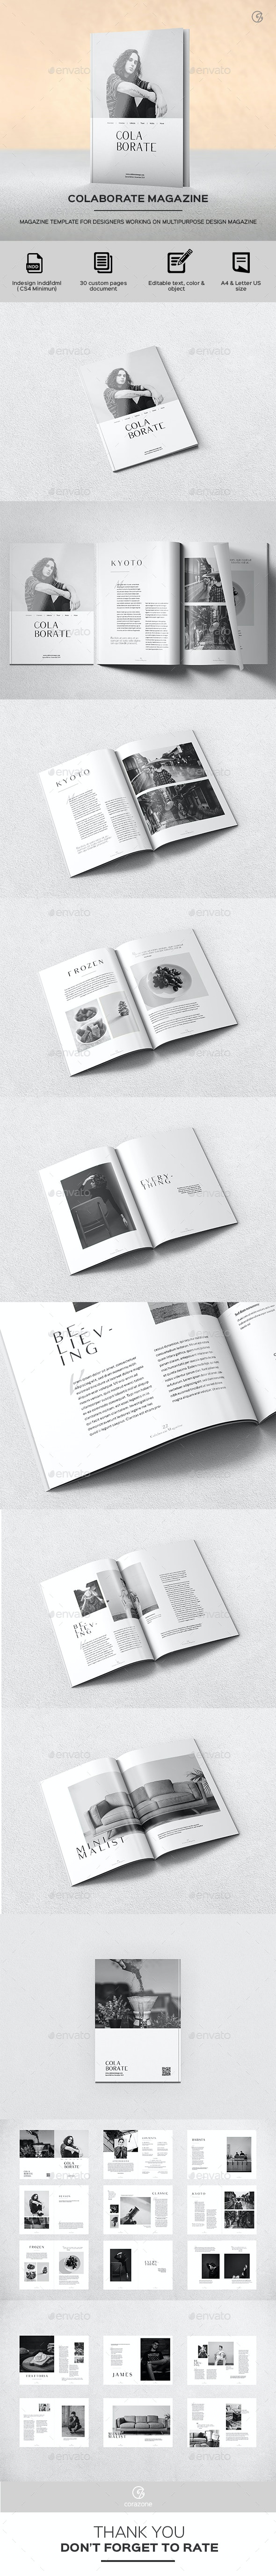 Colaborate Magazine (2019 Edition) - Magazines Print Templates